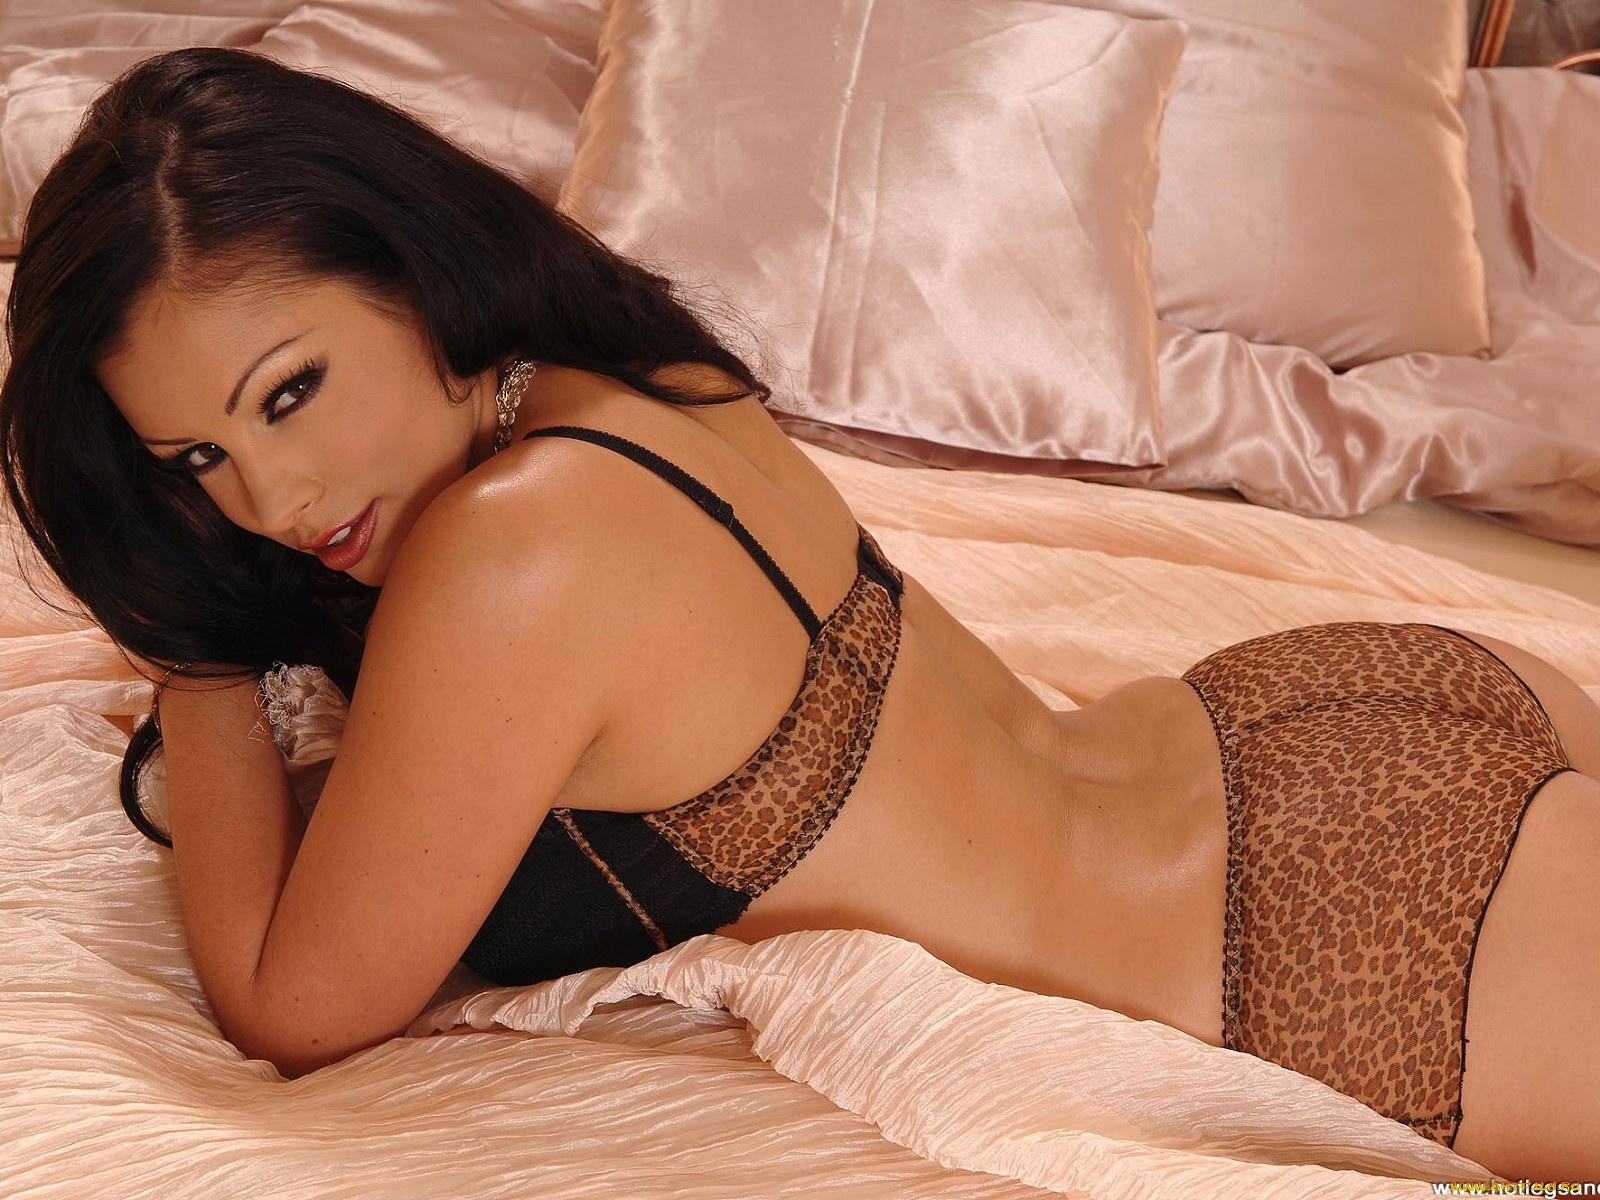 Фото ариа джовани, Aria Giovanni - все порно и секс фото модели 15 фотография